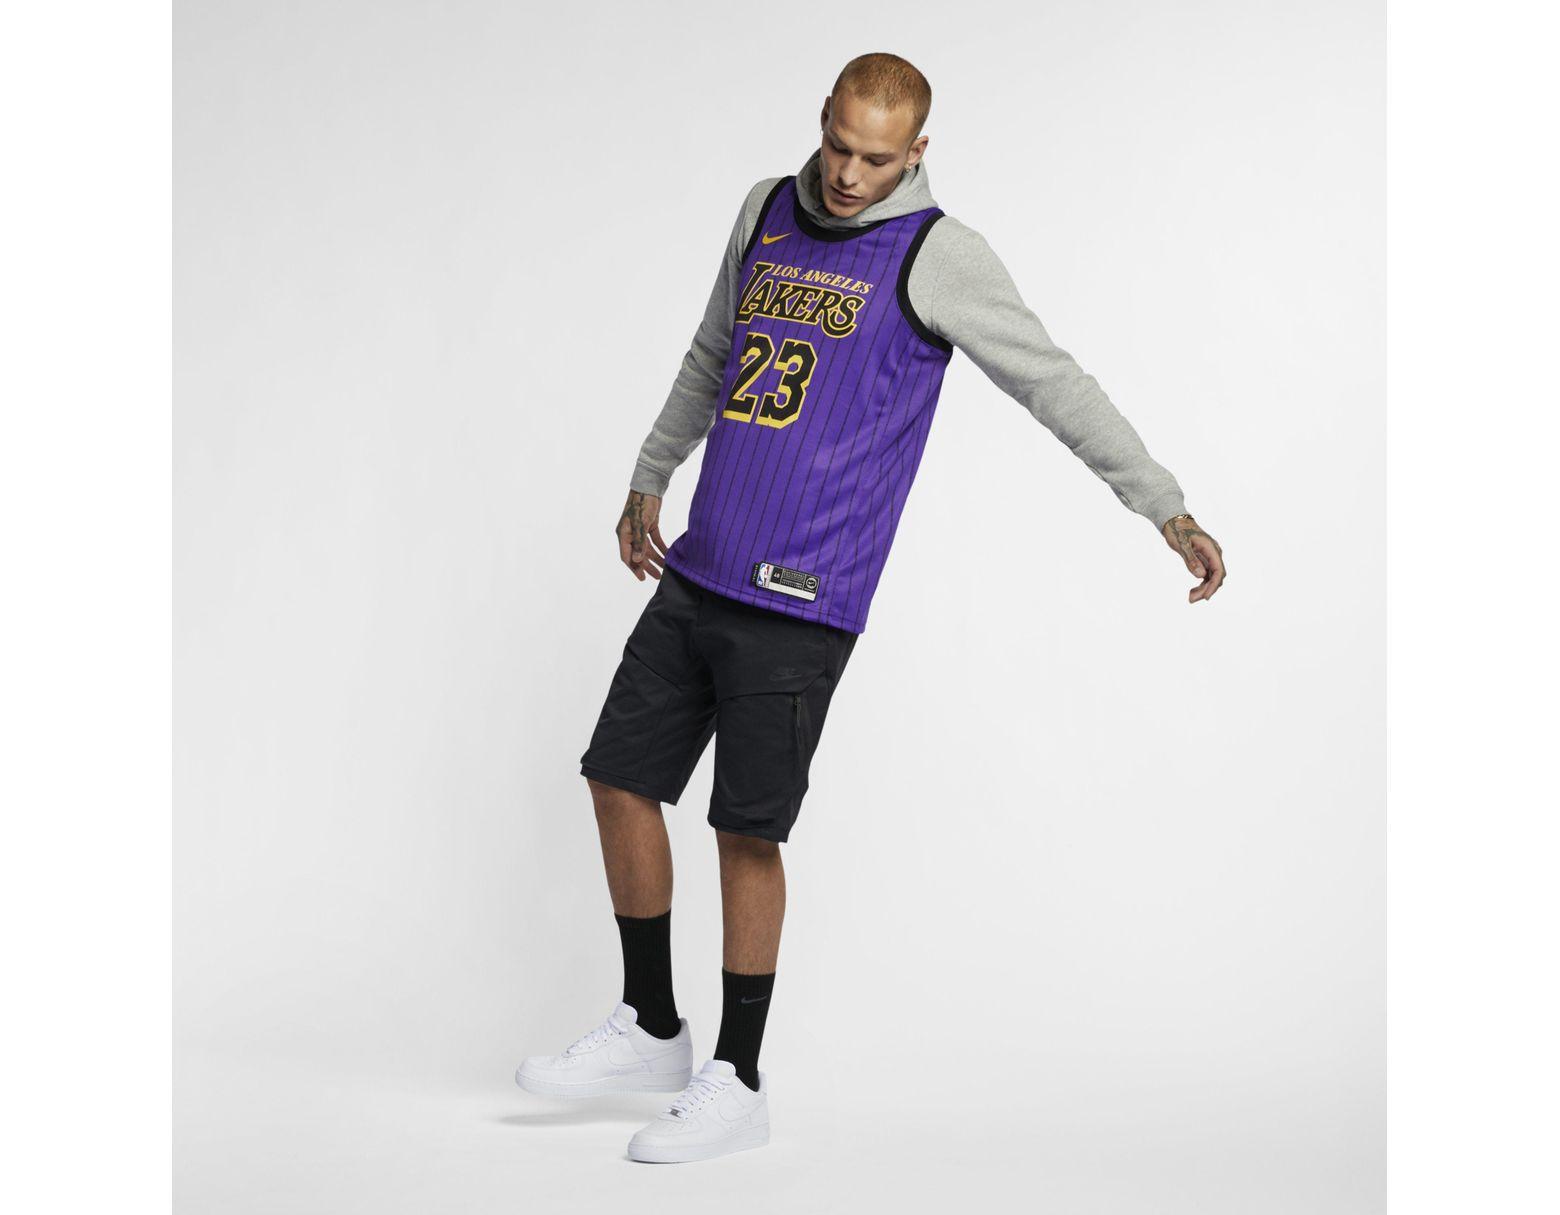 super popular a785d 5b72b Nike Lebron James Nba City Edition Swingman Jersey in Purple ...